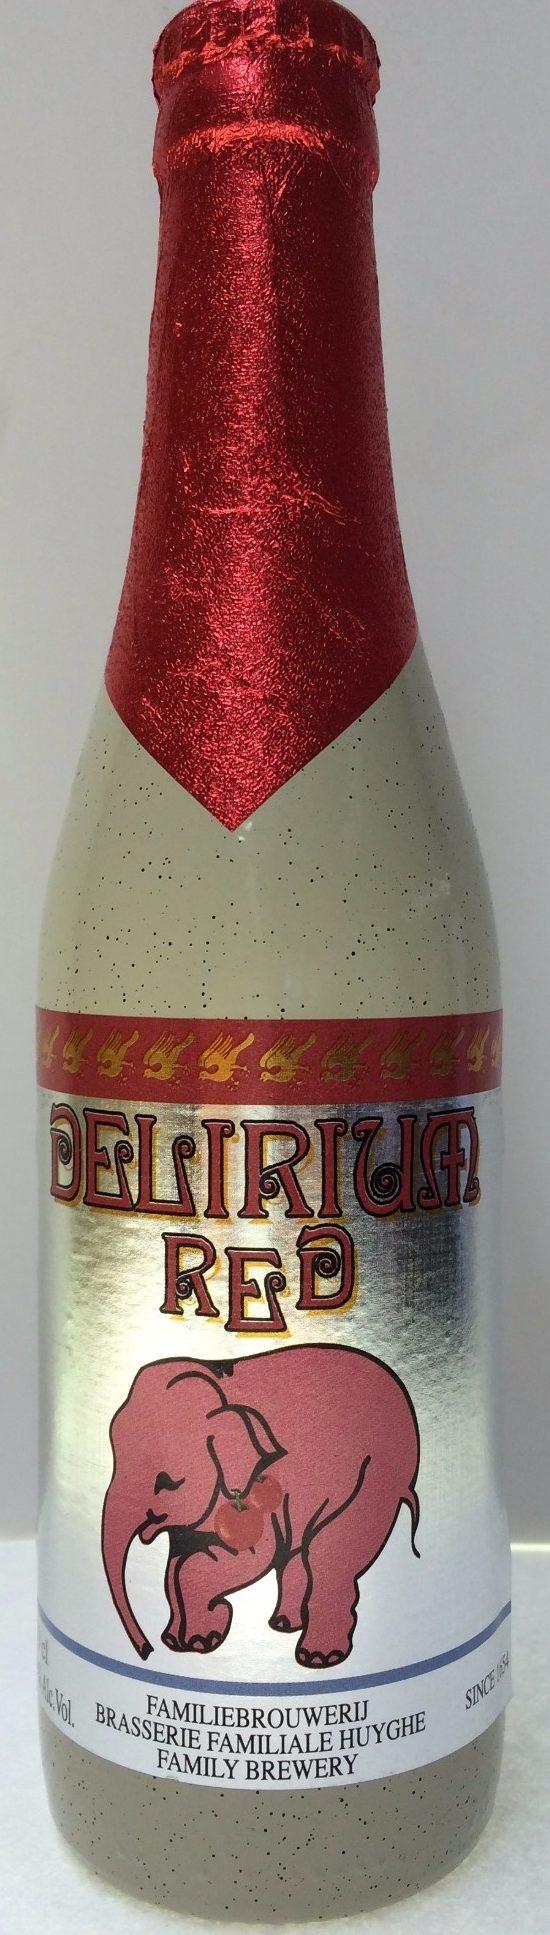 Delirium Red - Product - en